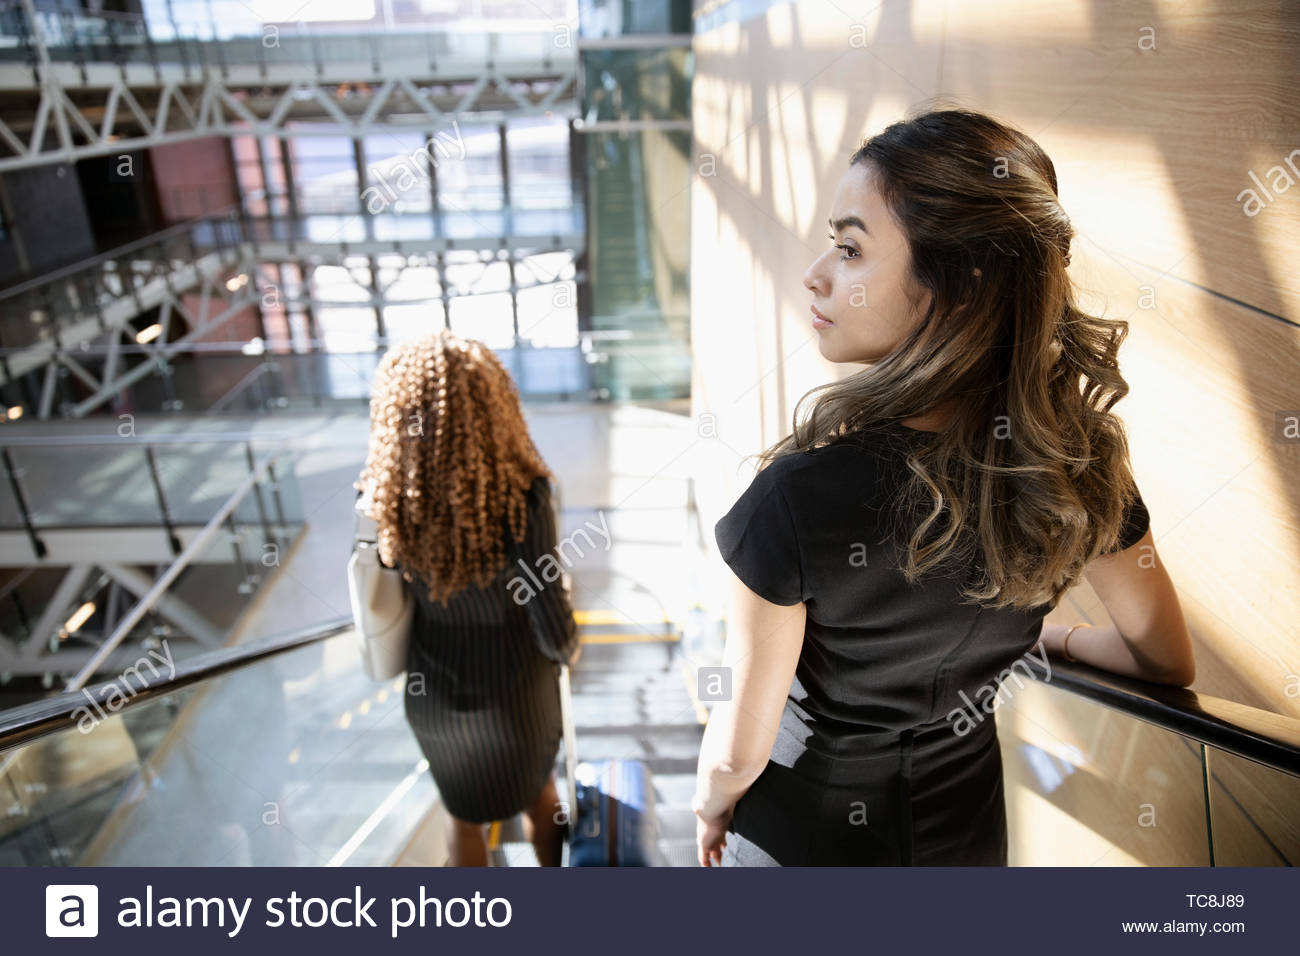 Businesswomen descending escalator in office - Stock Image